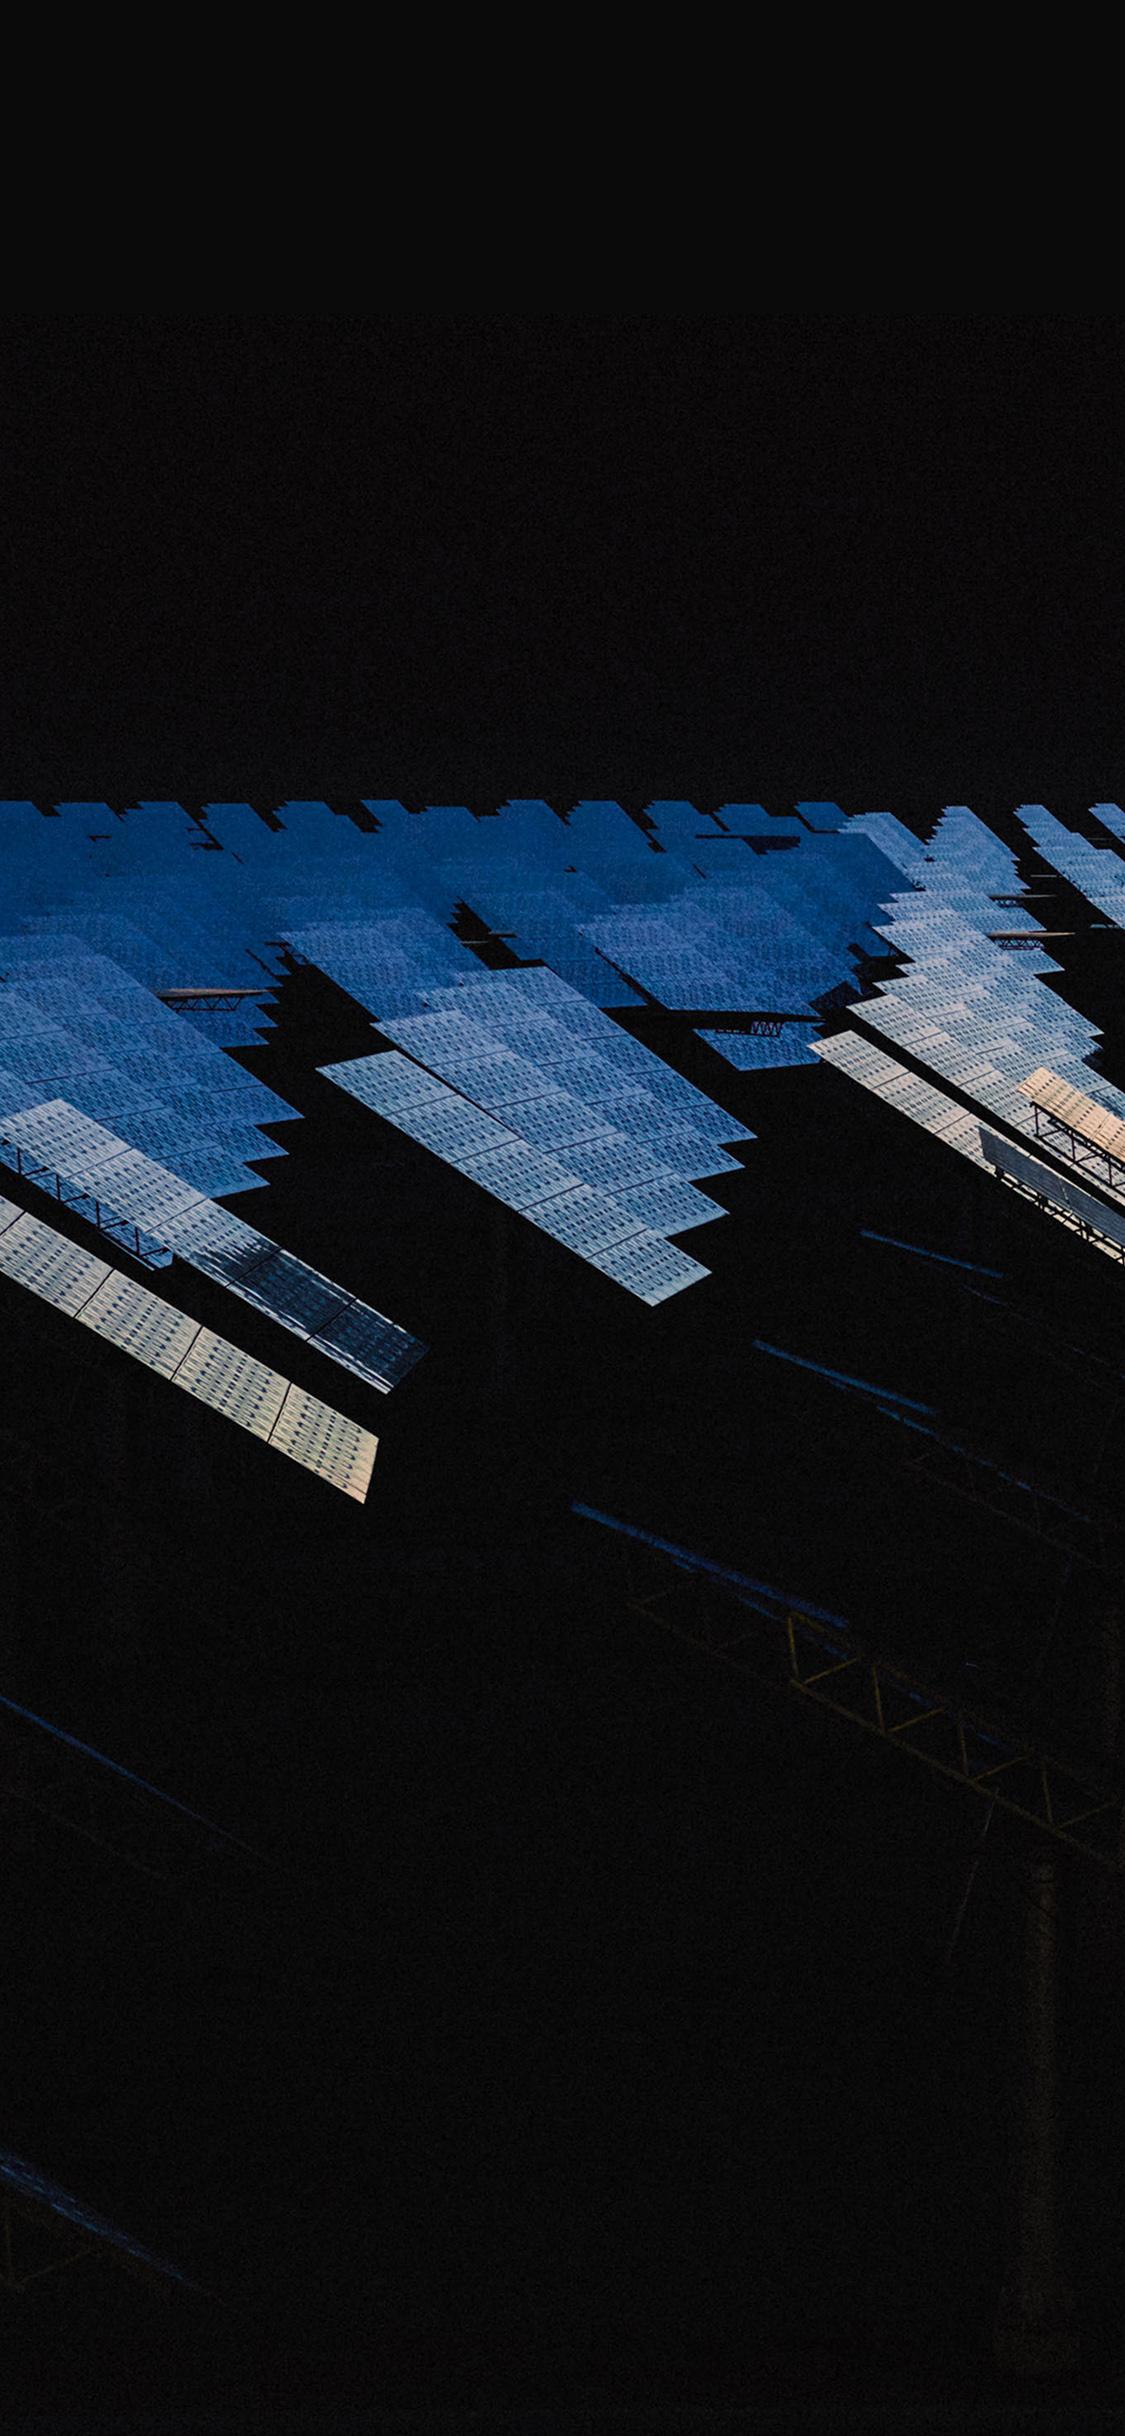 iPhoneXpapers.com-Apple-iPhone-wallpaper-bb58-sun-electric-generators-dark-illustration-art